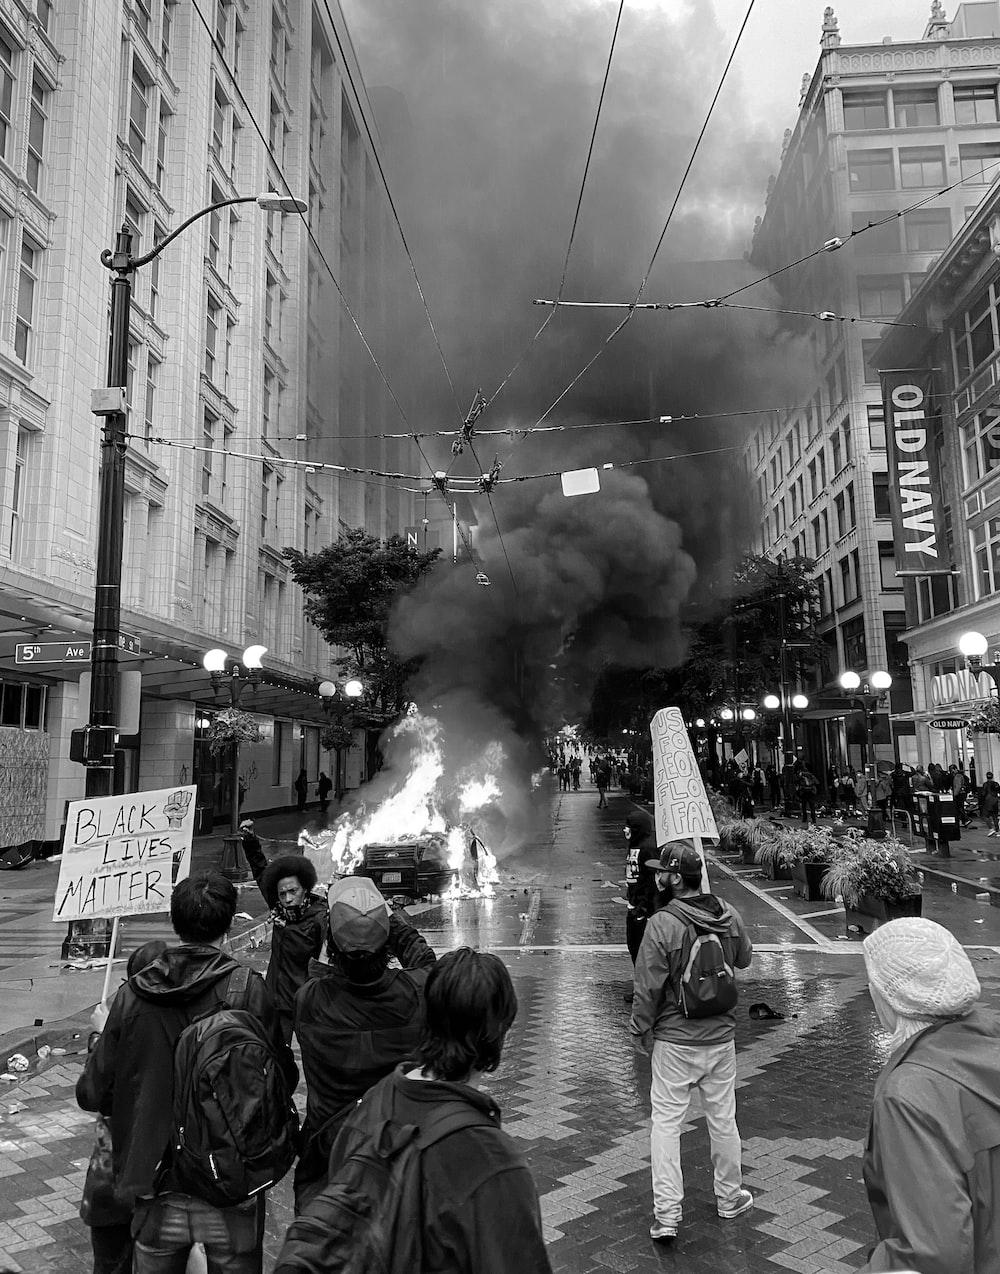 grayscale photo of people walking on street with smoke